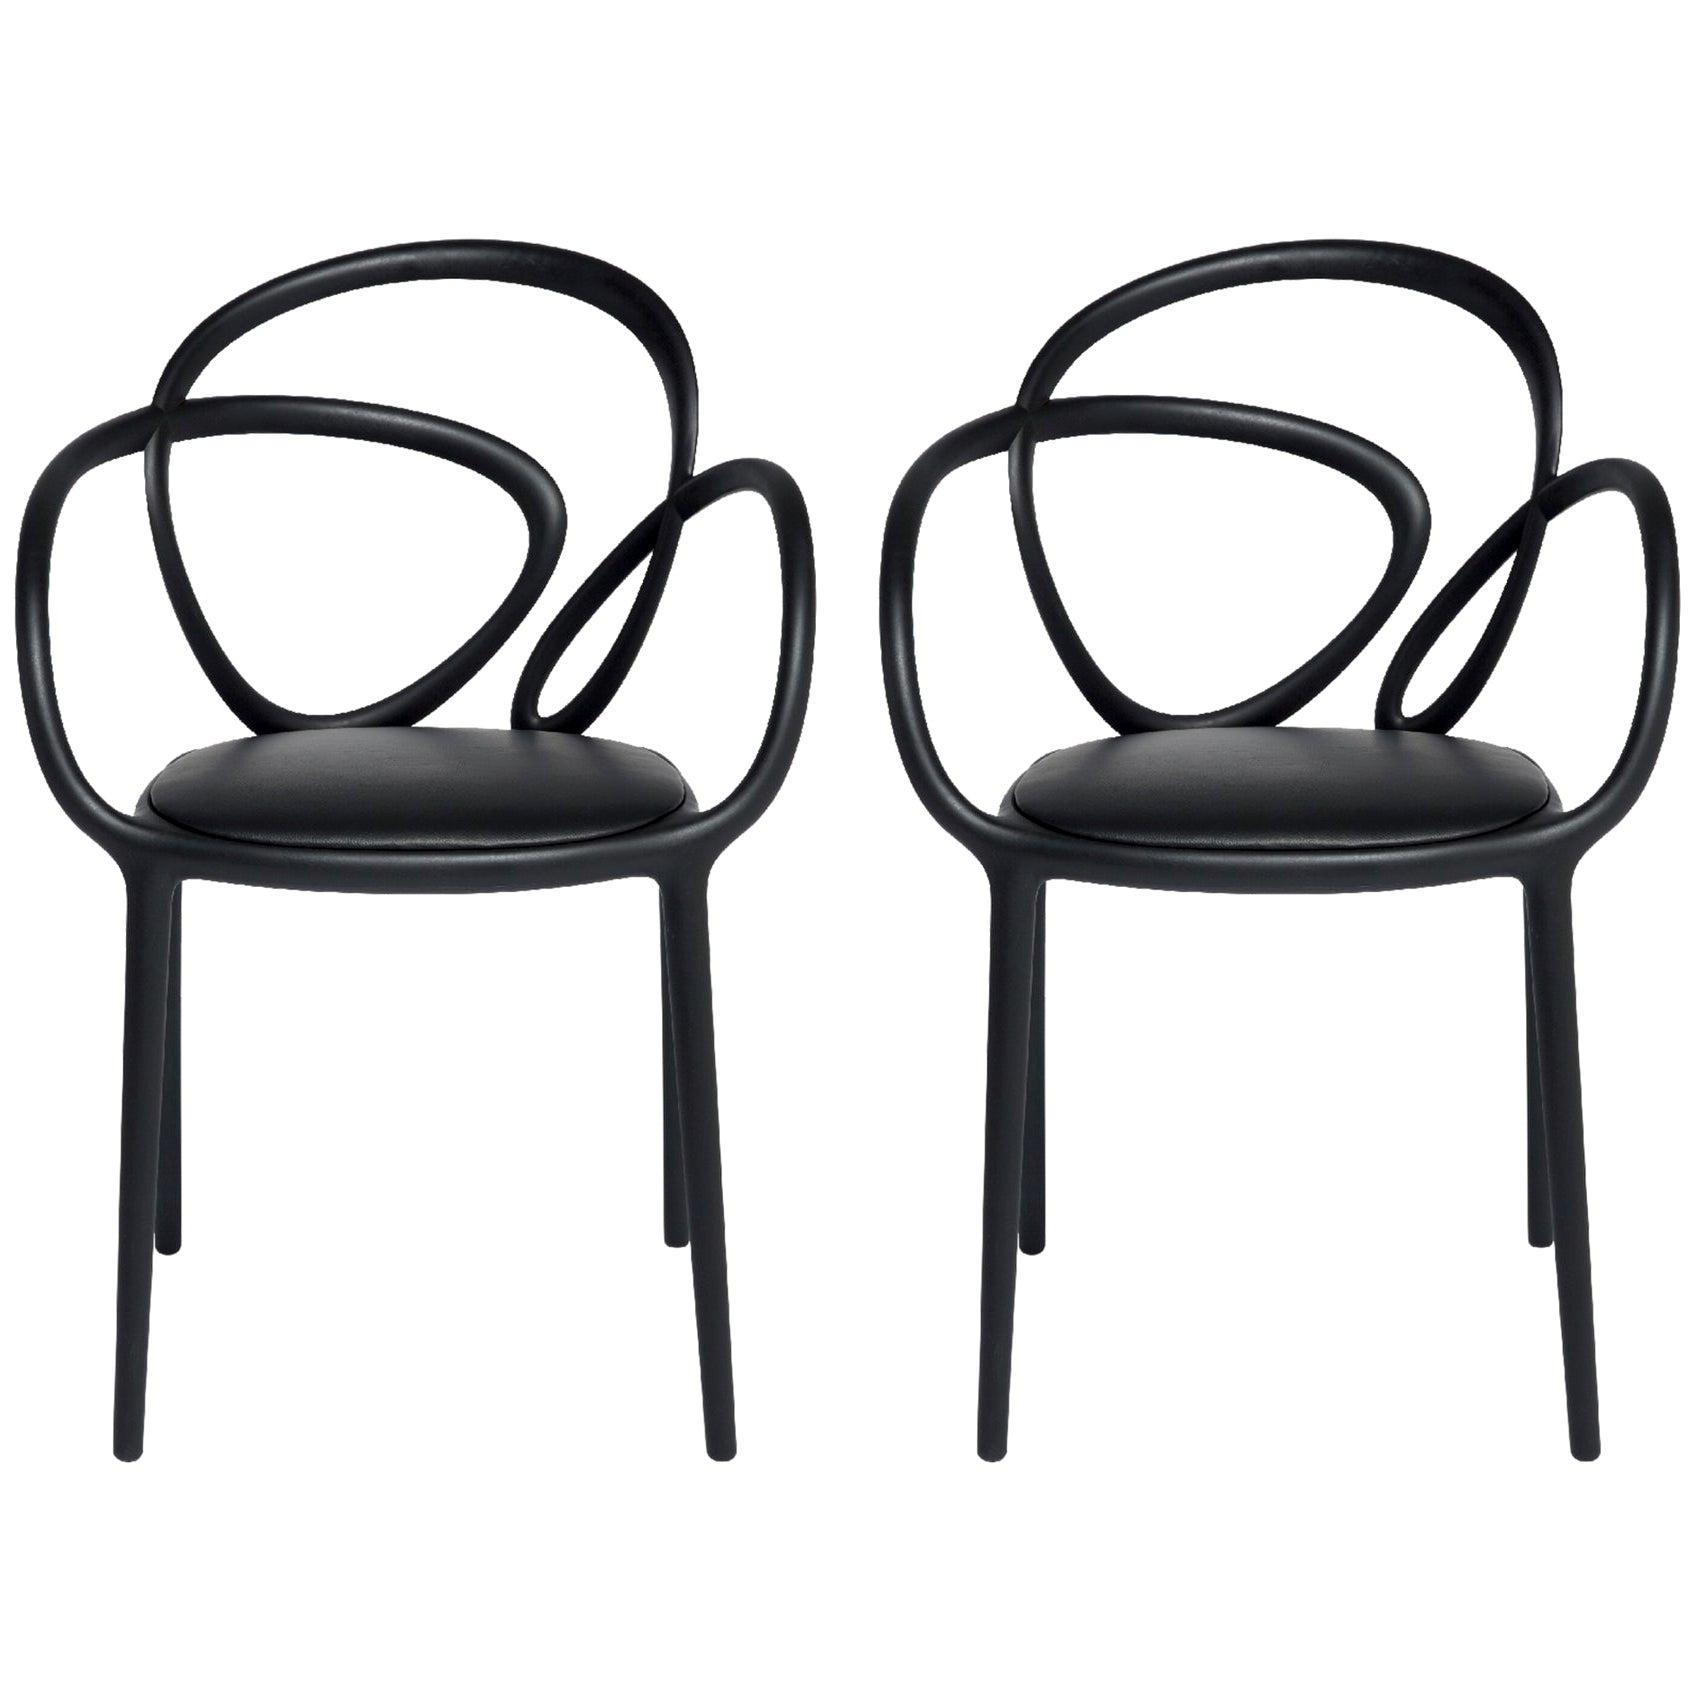 Set of 2 Black Loop Padded Armchair, Made in Italy